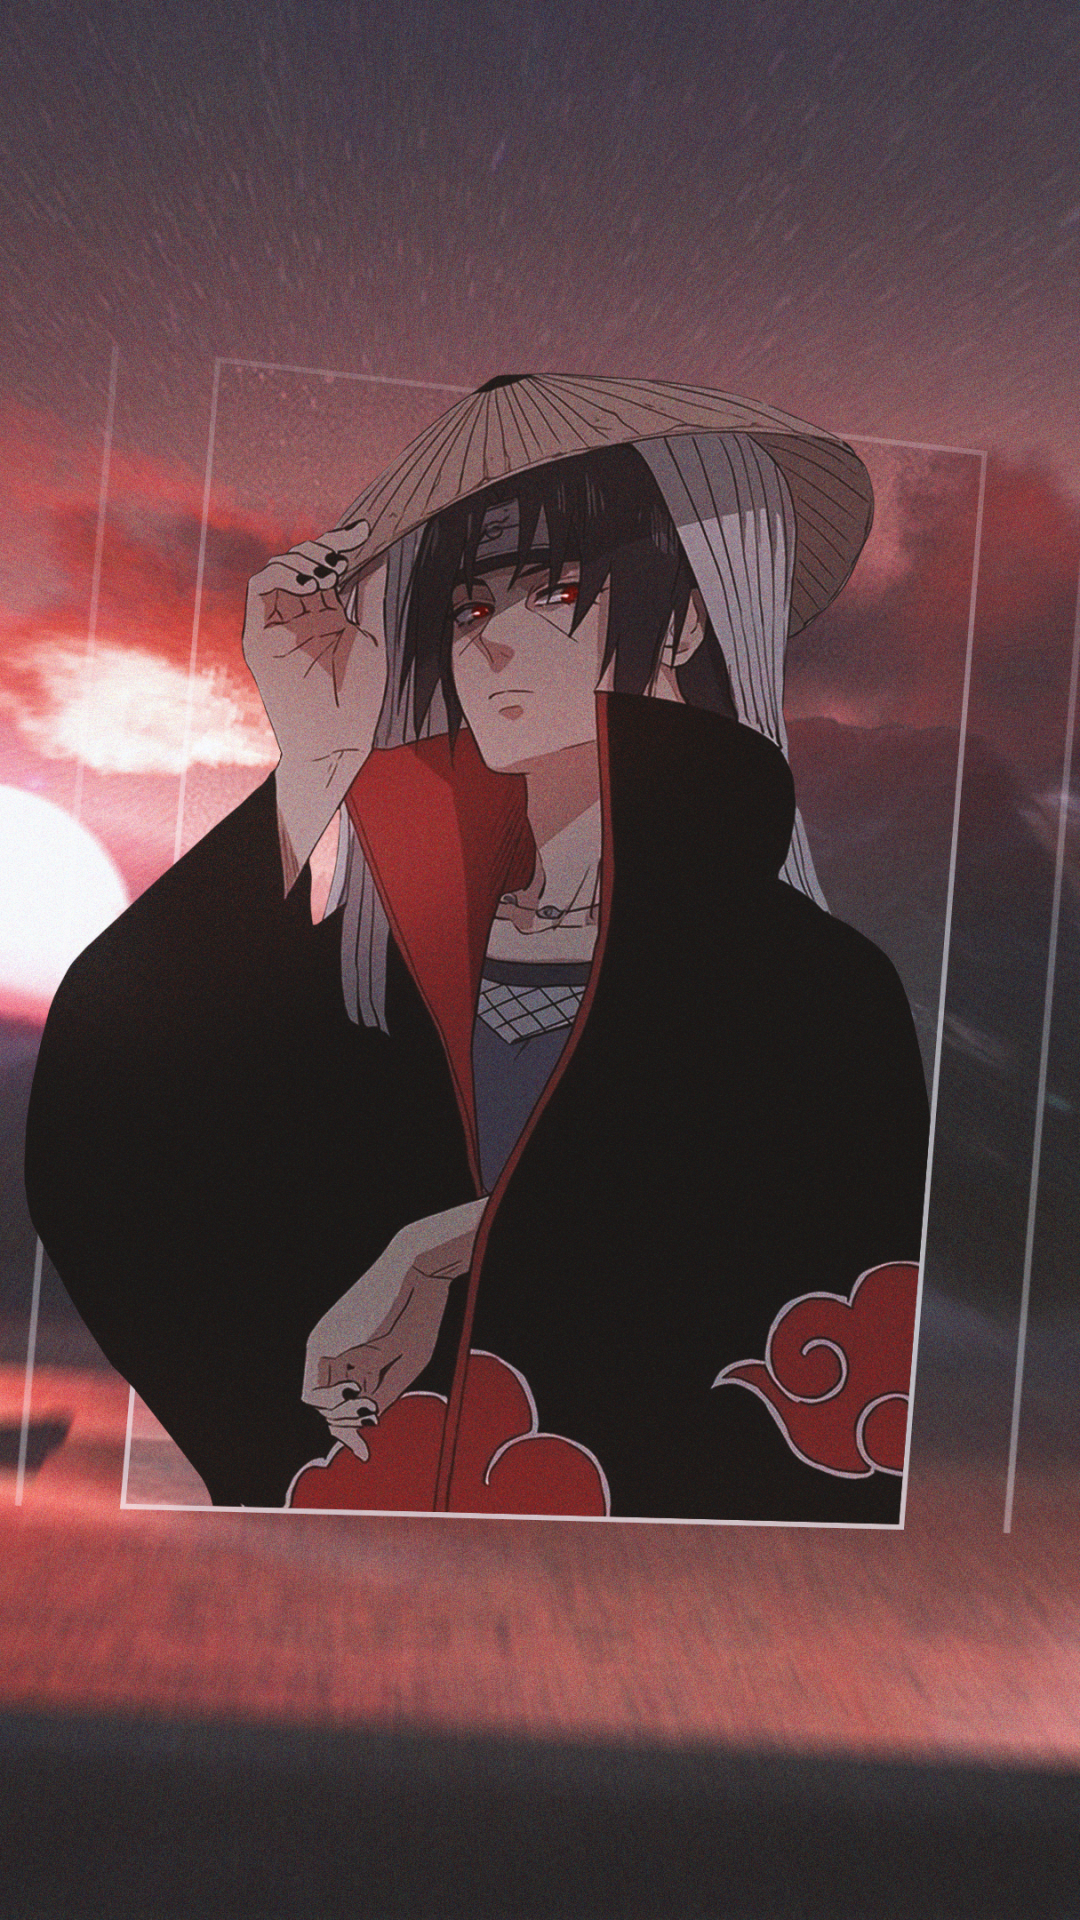 Naruto Rasengan Iphone Hd Wallpaper Image 4k